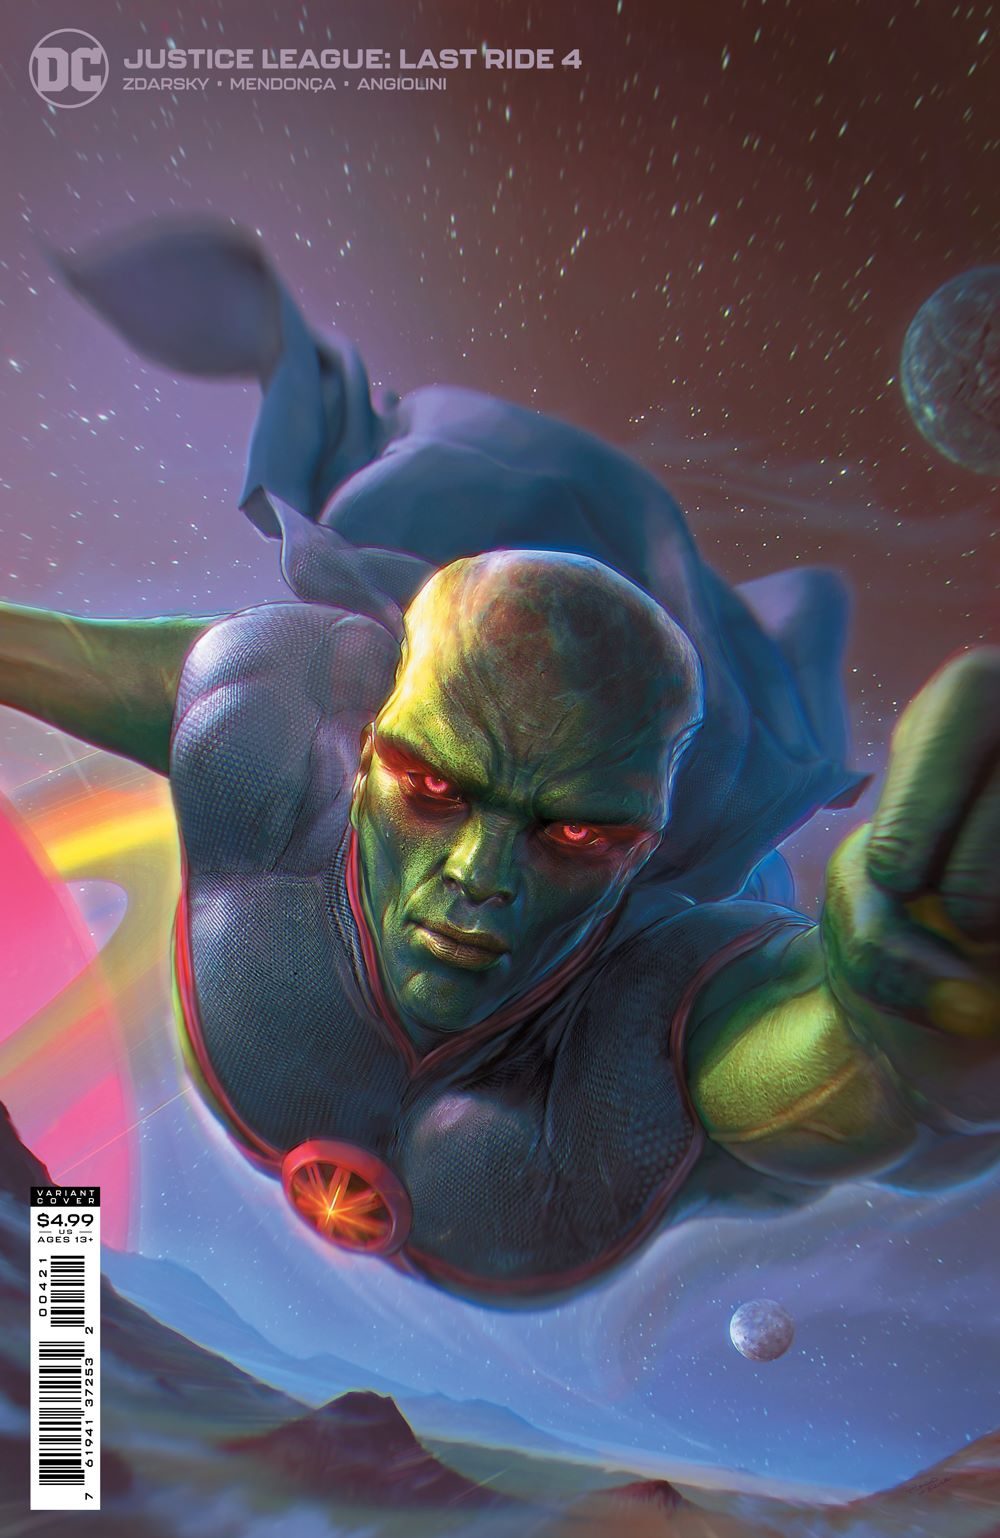 JLLR_Cv4_var DC Comics August 2021 Solicitations